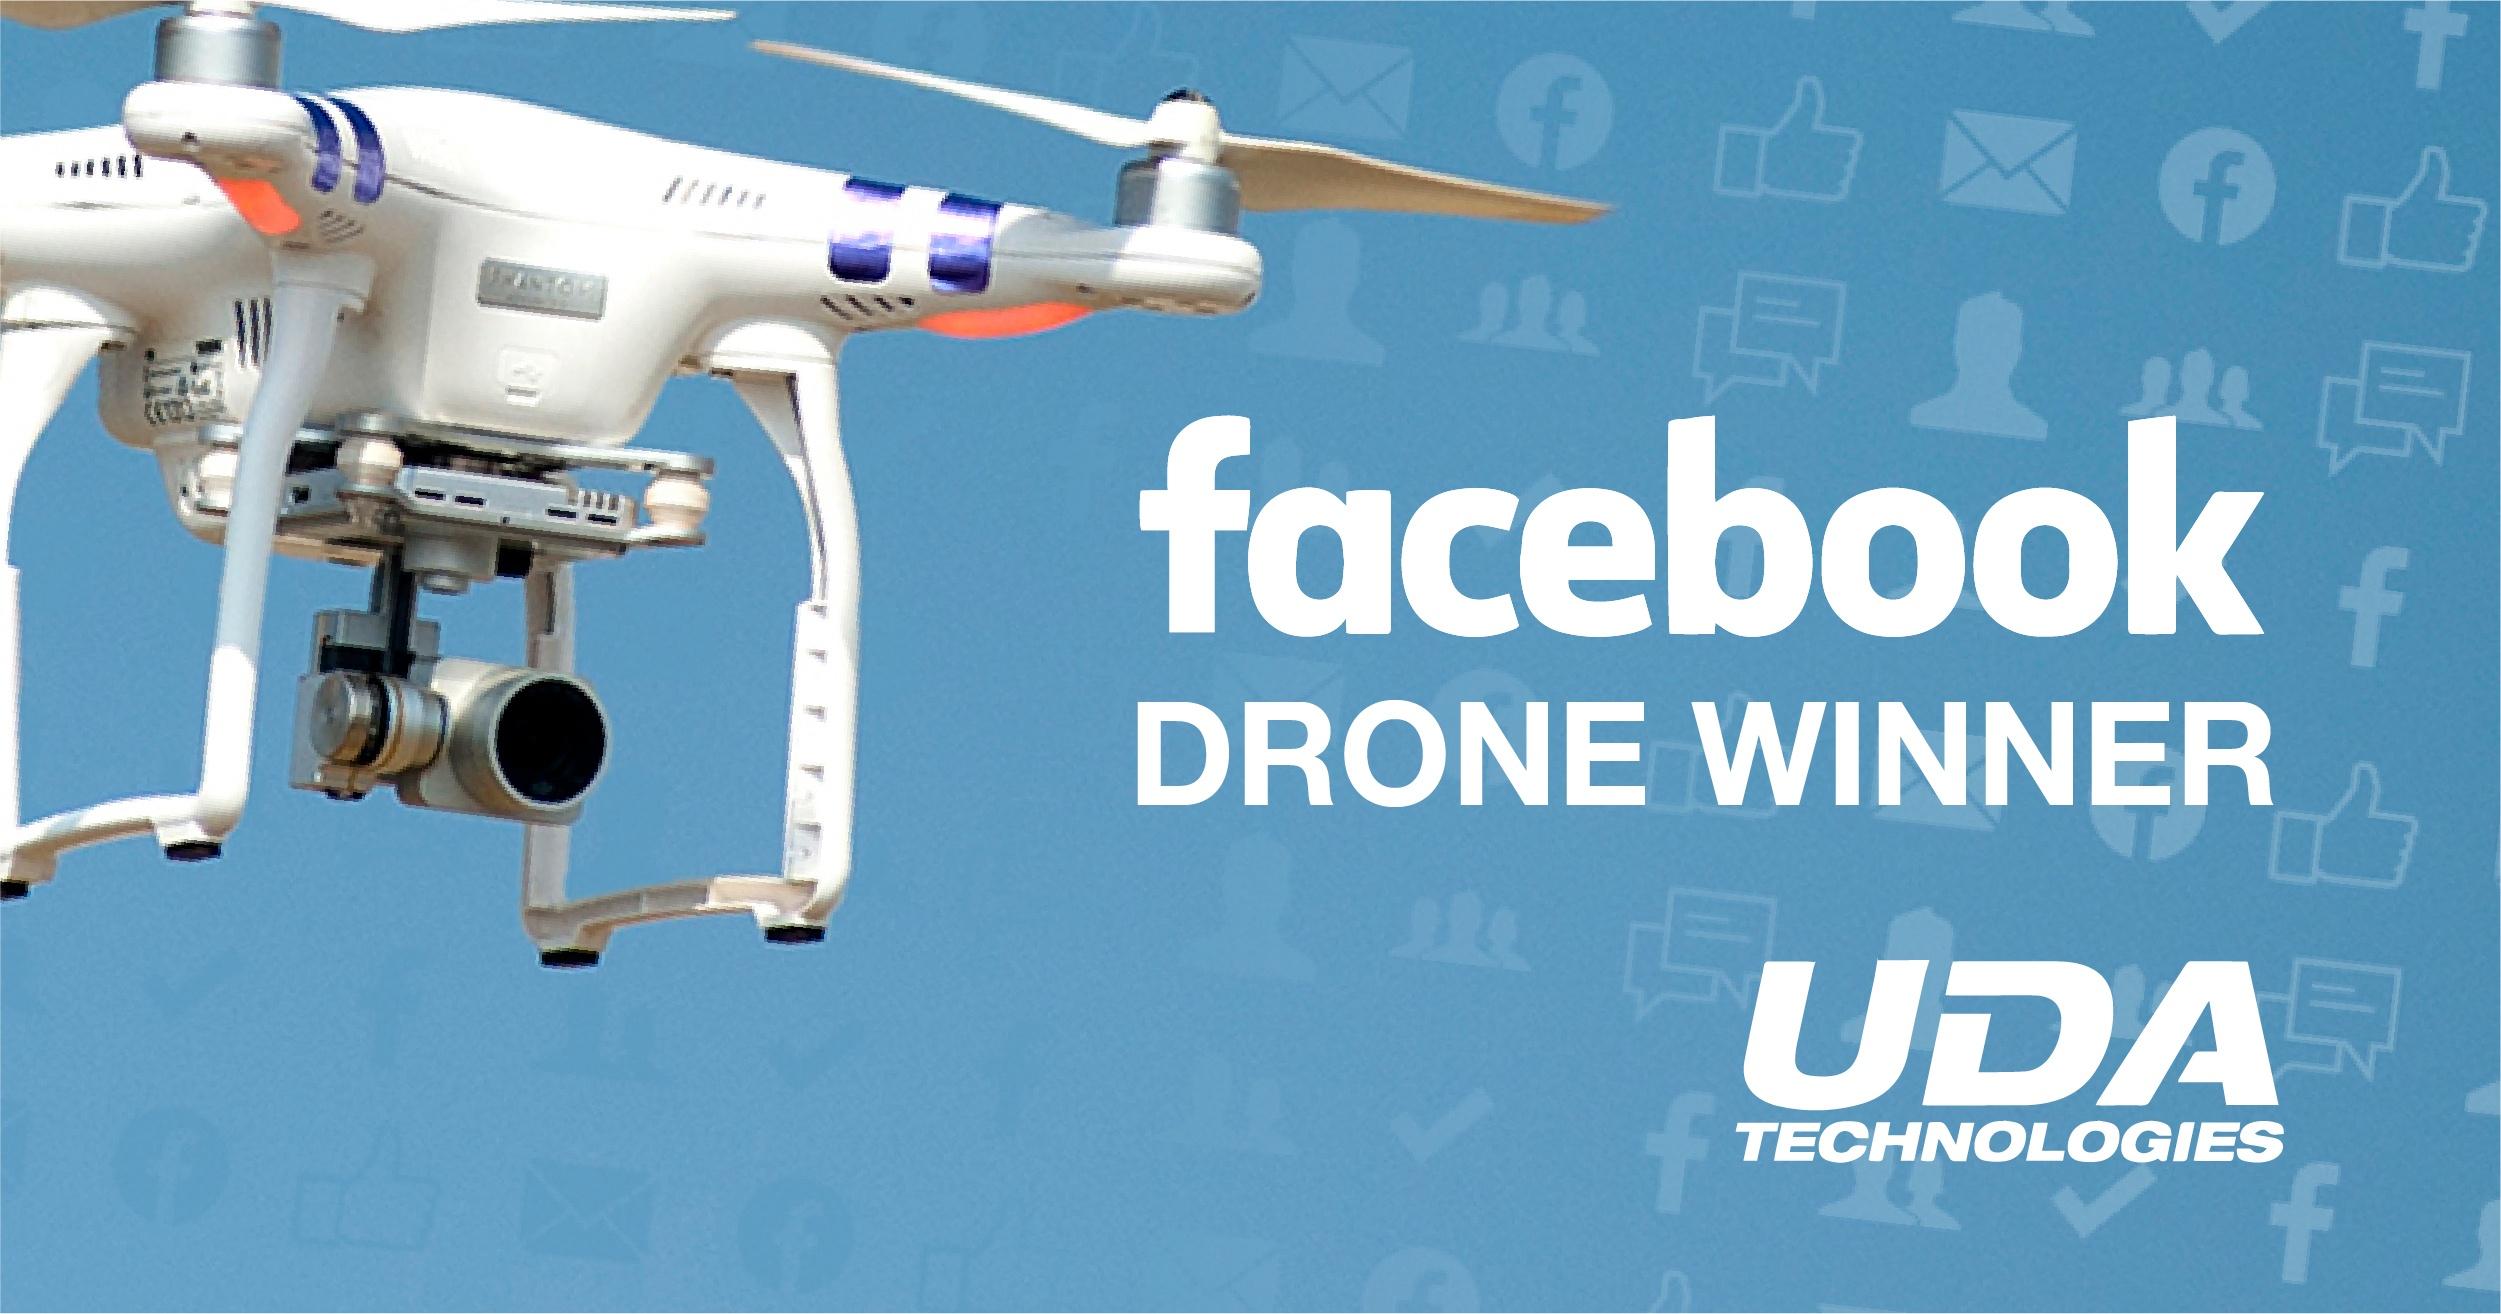 UDA Technologies Announces Facebook Drone Winner